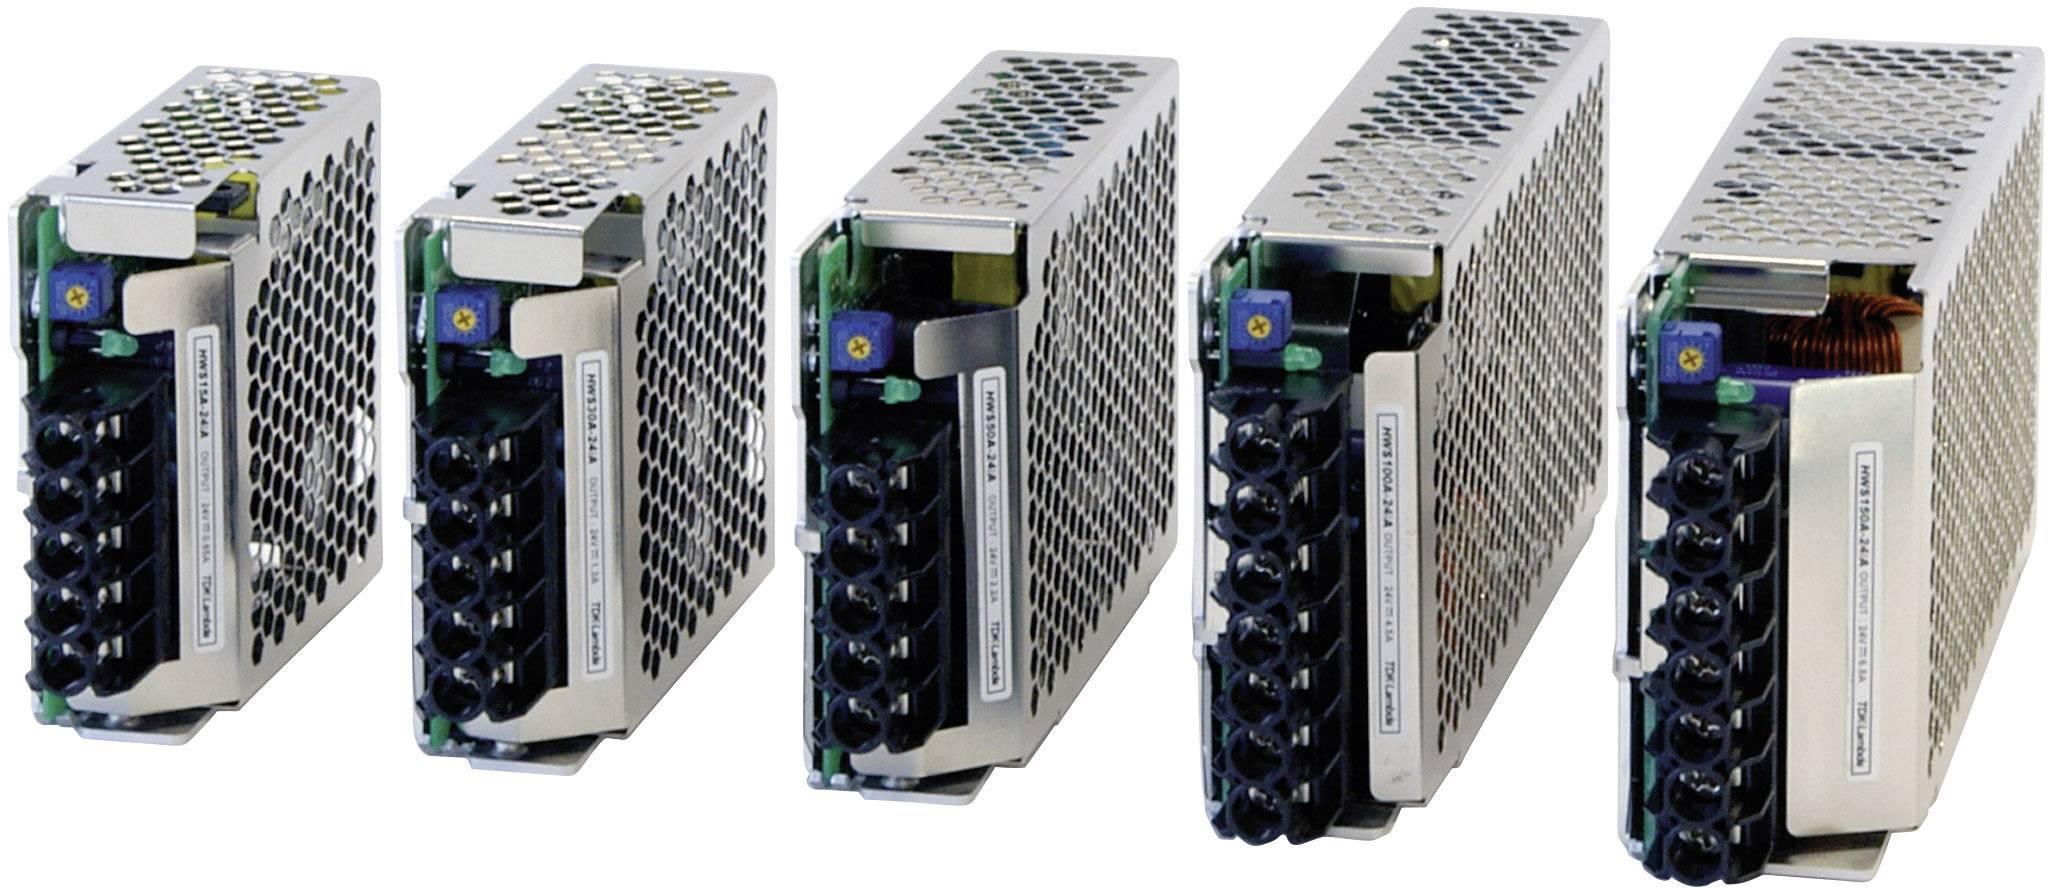 Zabudovateľný napájací zdroj TDK-Lambda HWS-150A-5/A, 5 V, 150 W